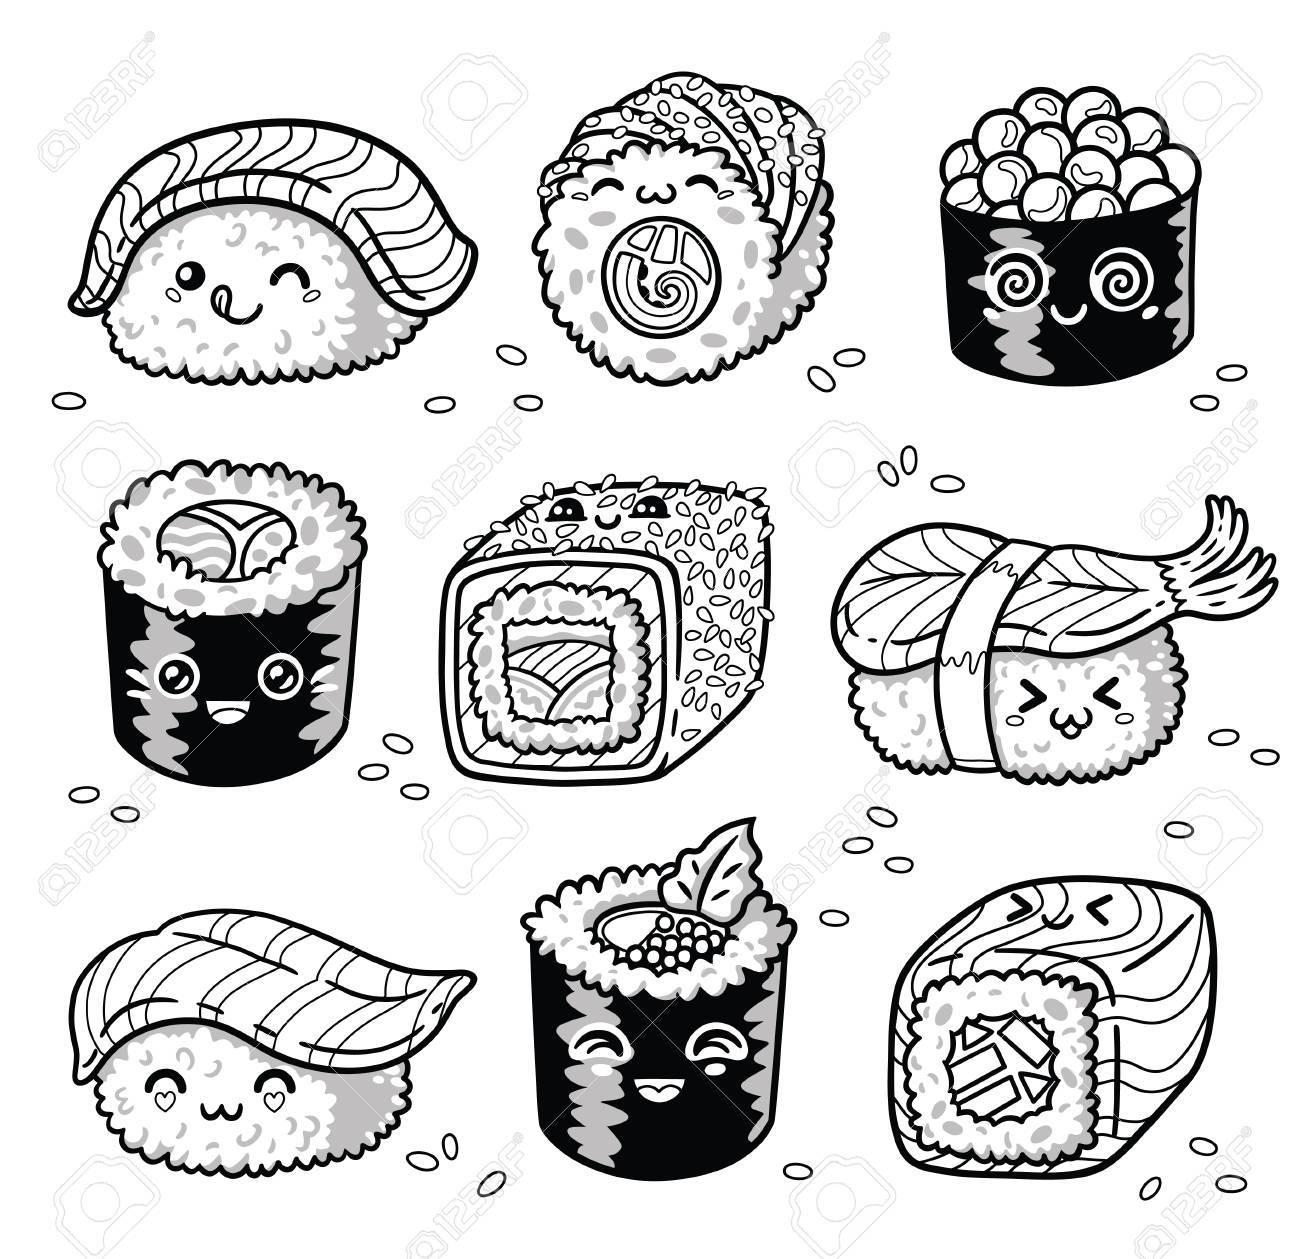 Kawaii Rolls And Sushi Manga Cartoon Set In Outline Stock Photo